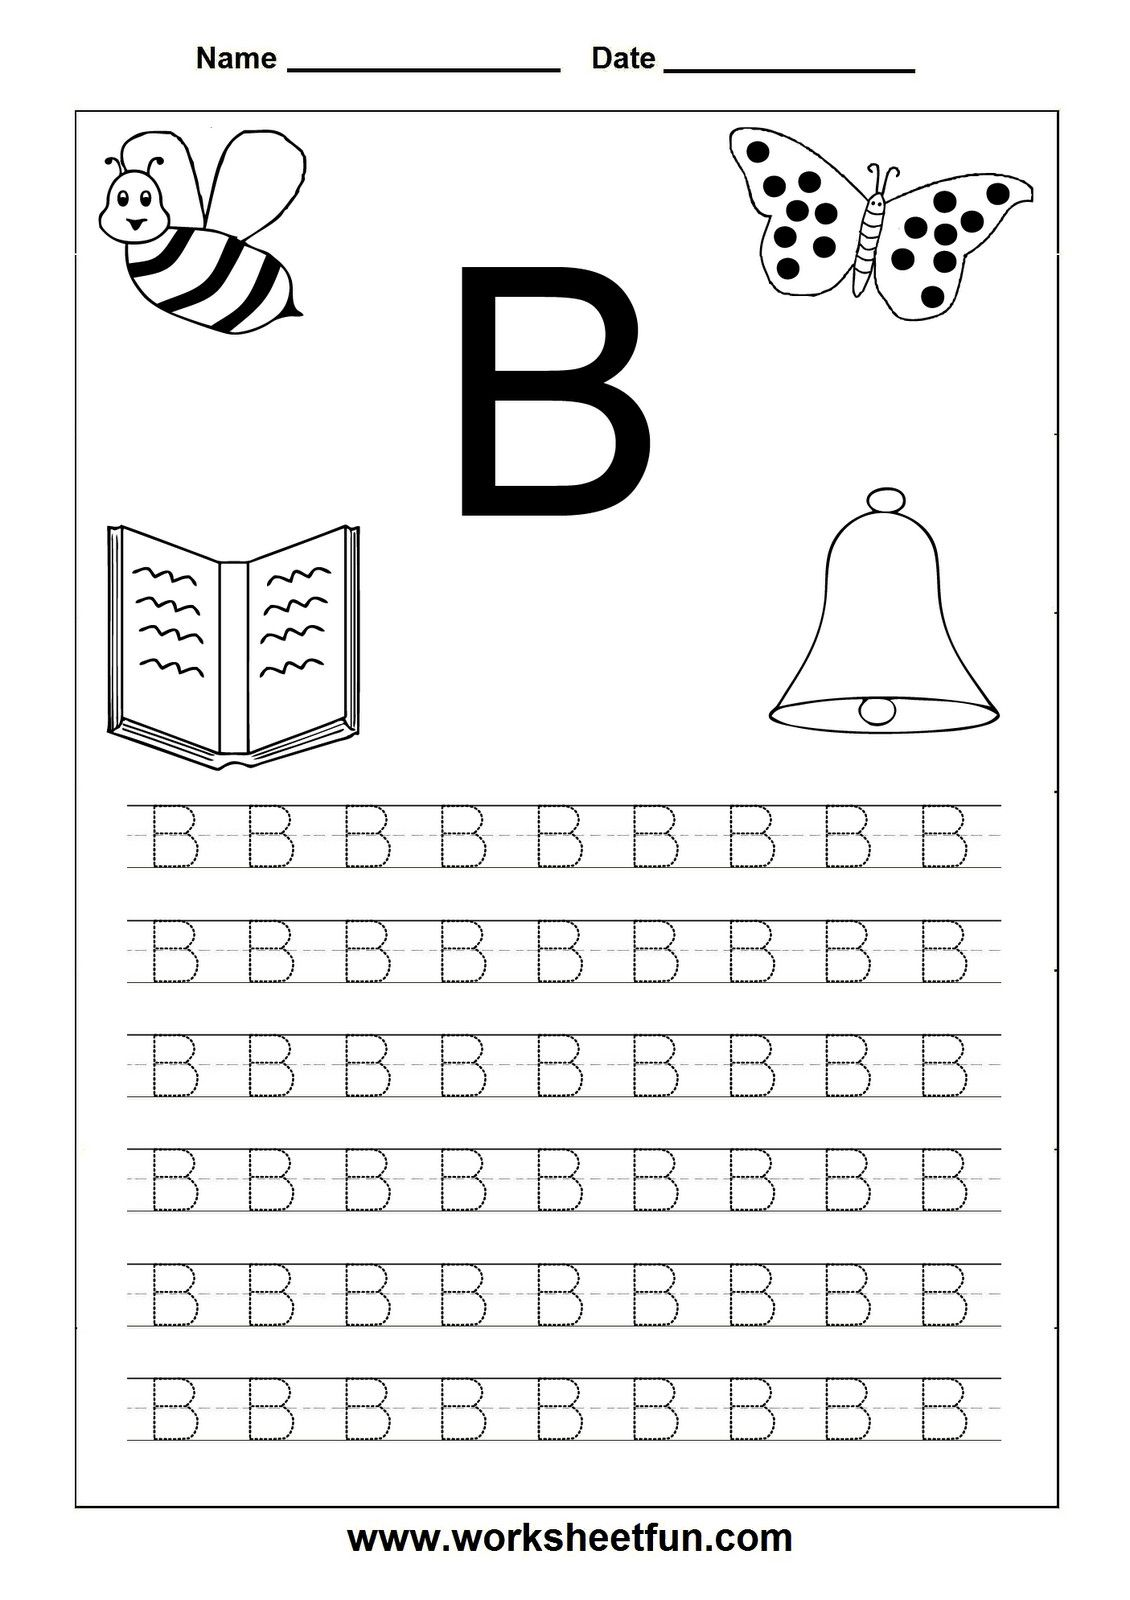 5 Preschool Letter B Tracing Worksheets In